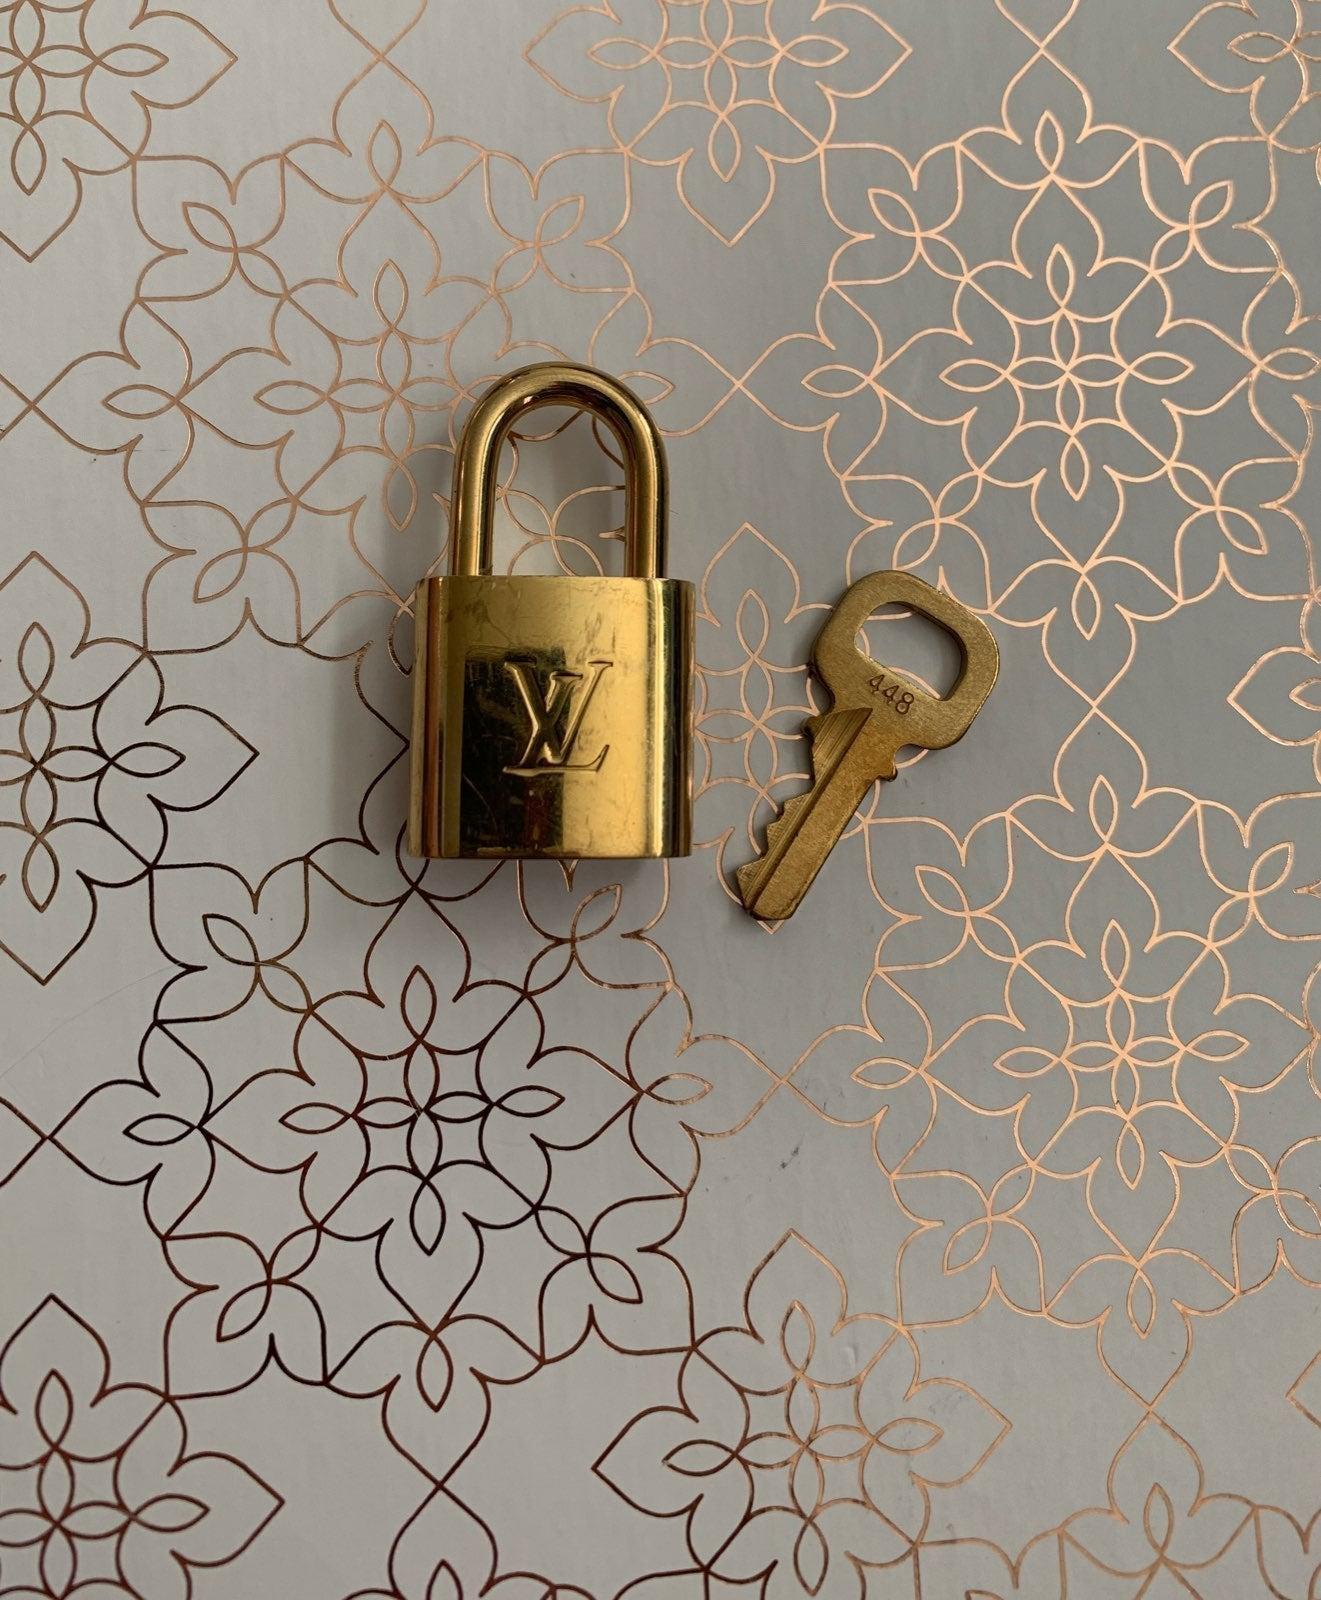 Louis Vuitton single lock and key